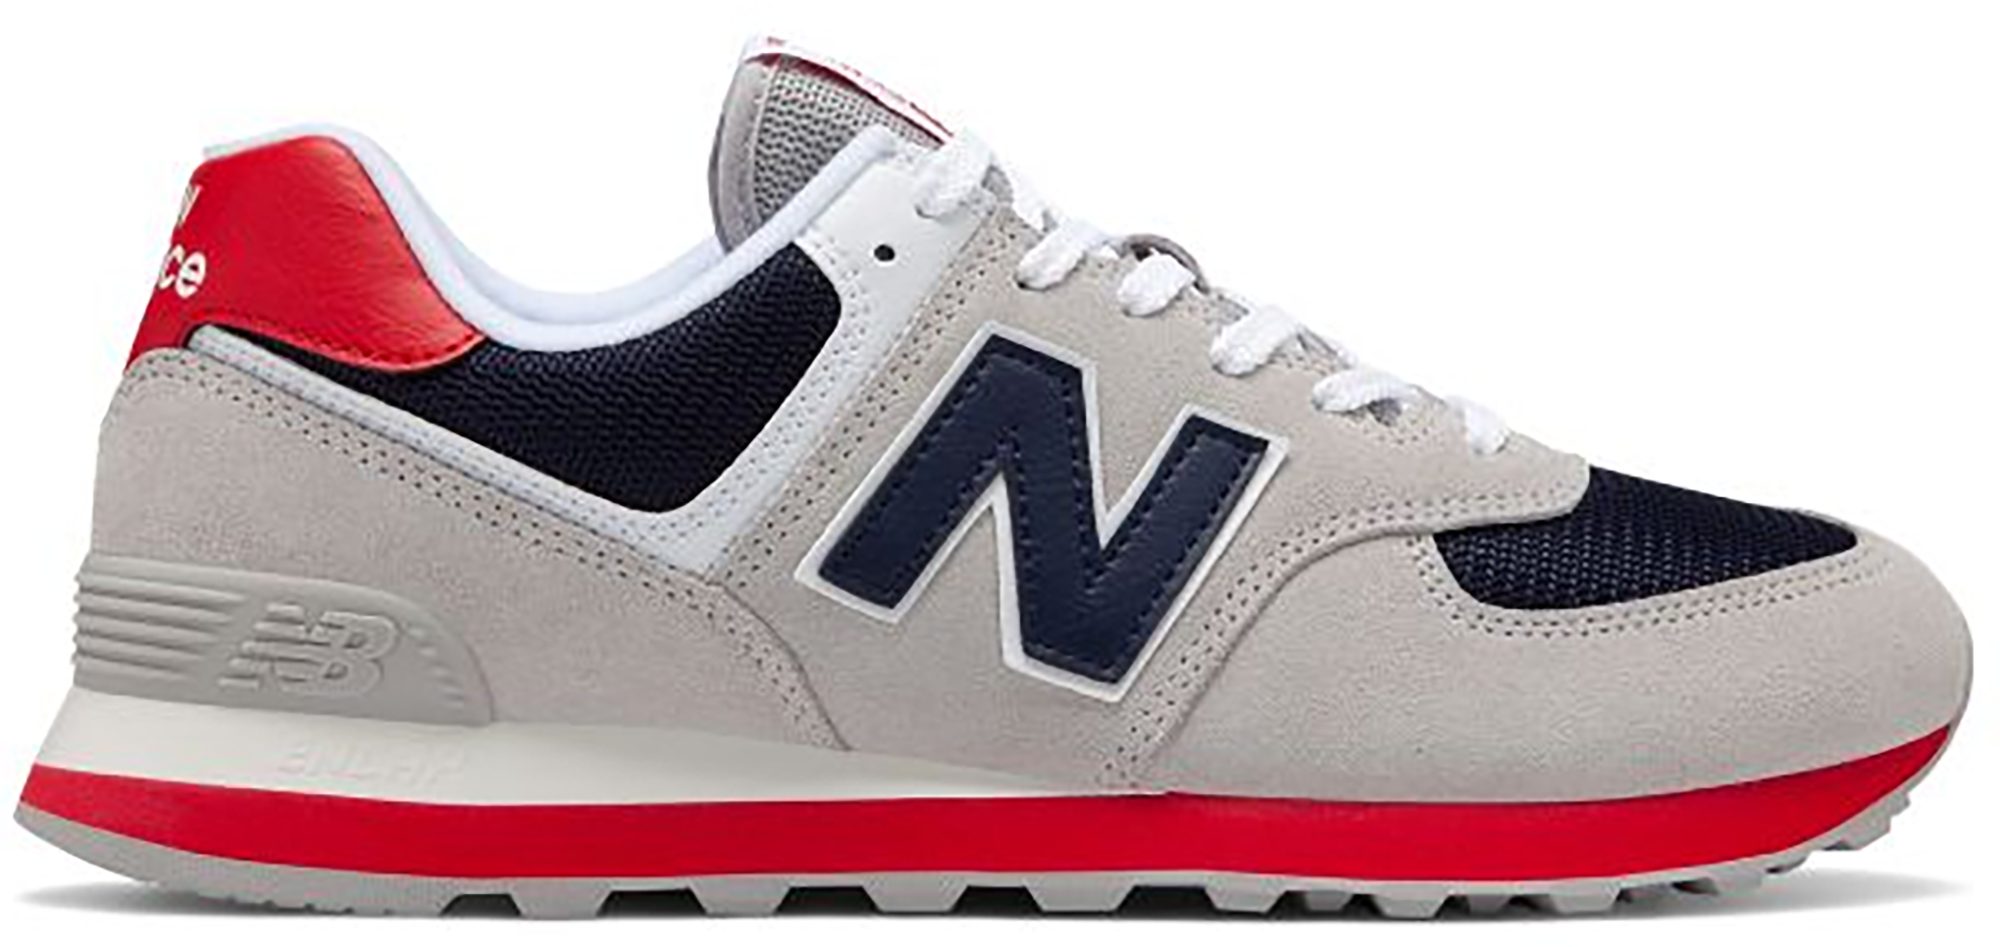 New Balance 574 Classic Grey Navy Red